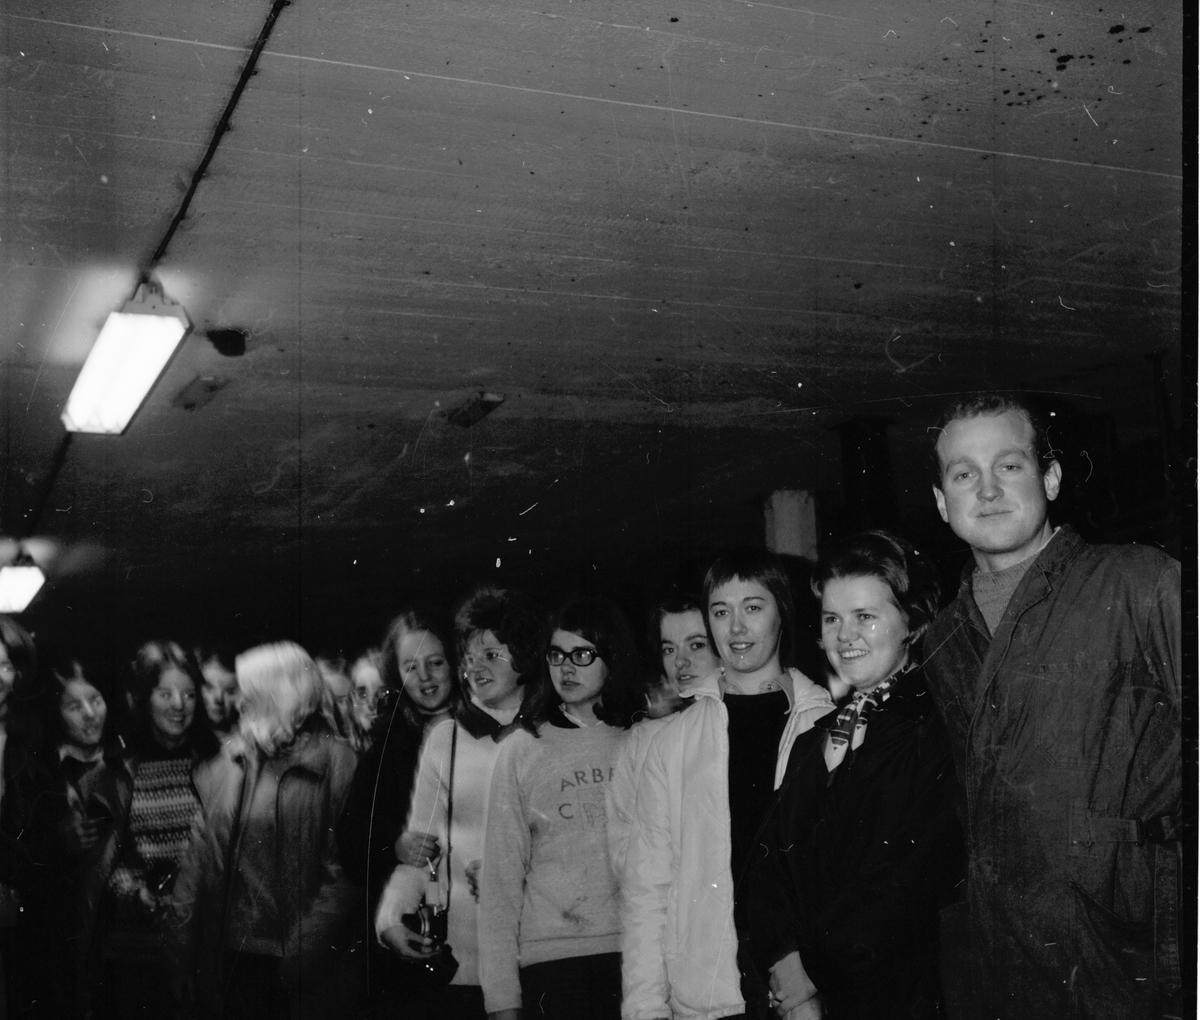 Nytorp, Besök av helsingegårdselever, Nov 1970